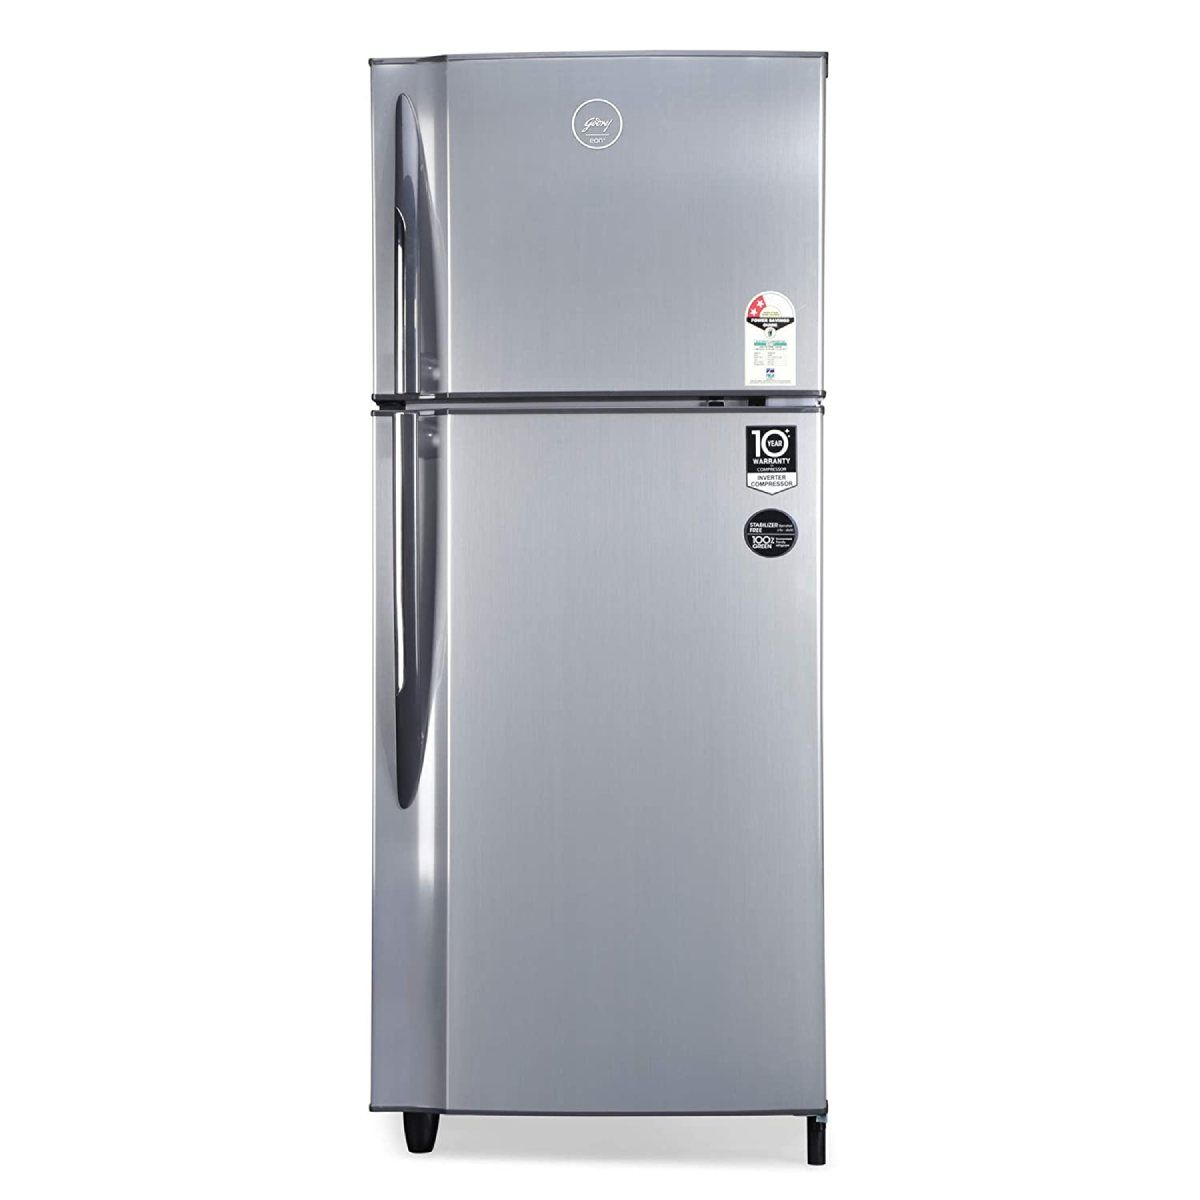 Godrej 236 L 2 Star Inverter Frost-Free Double Door Refrigerator (RF EON 236B 25 HI SI ST)